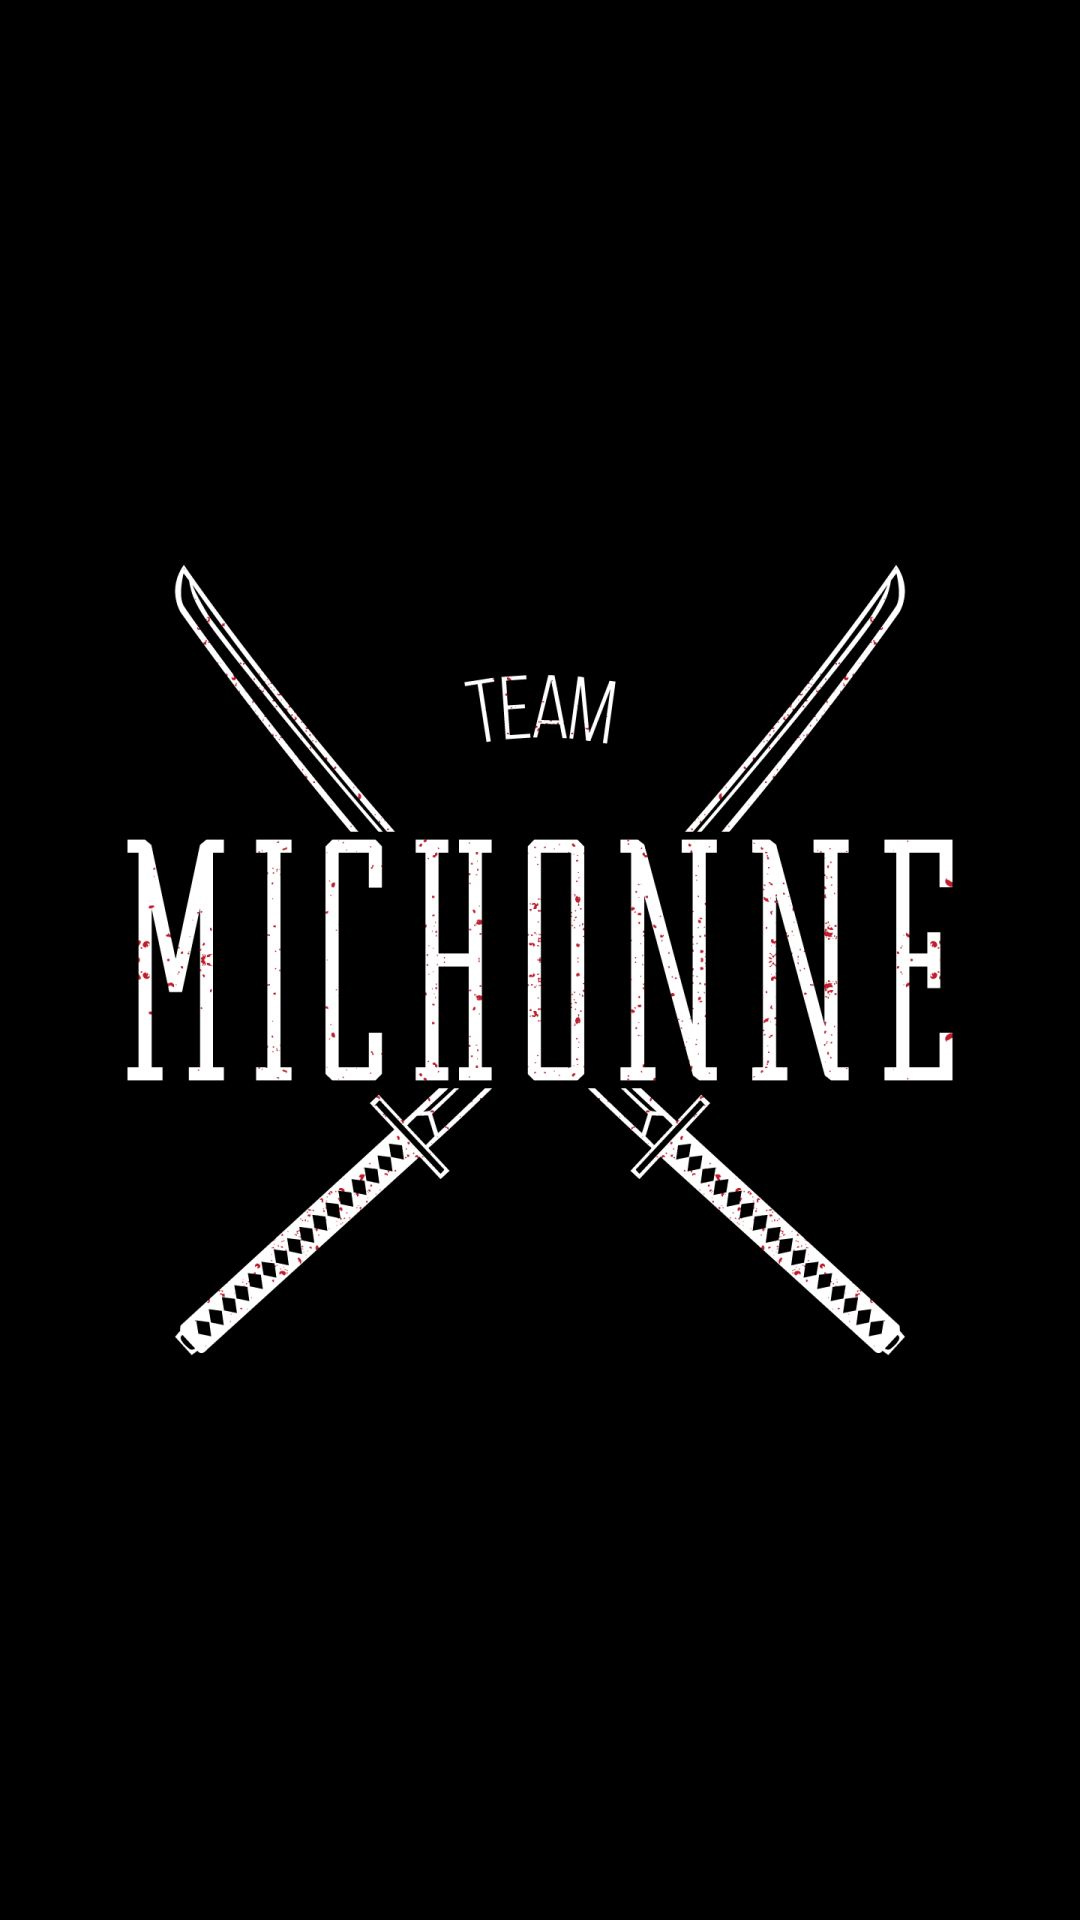 Free Download Team Michonne The Walking Dead Iphone 6 Hd Wallpaper